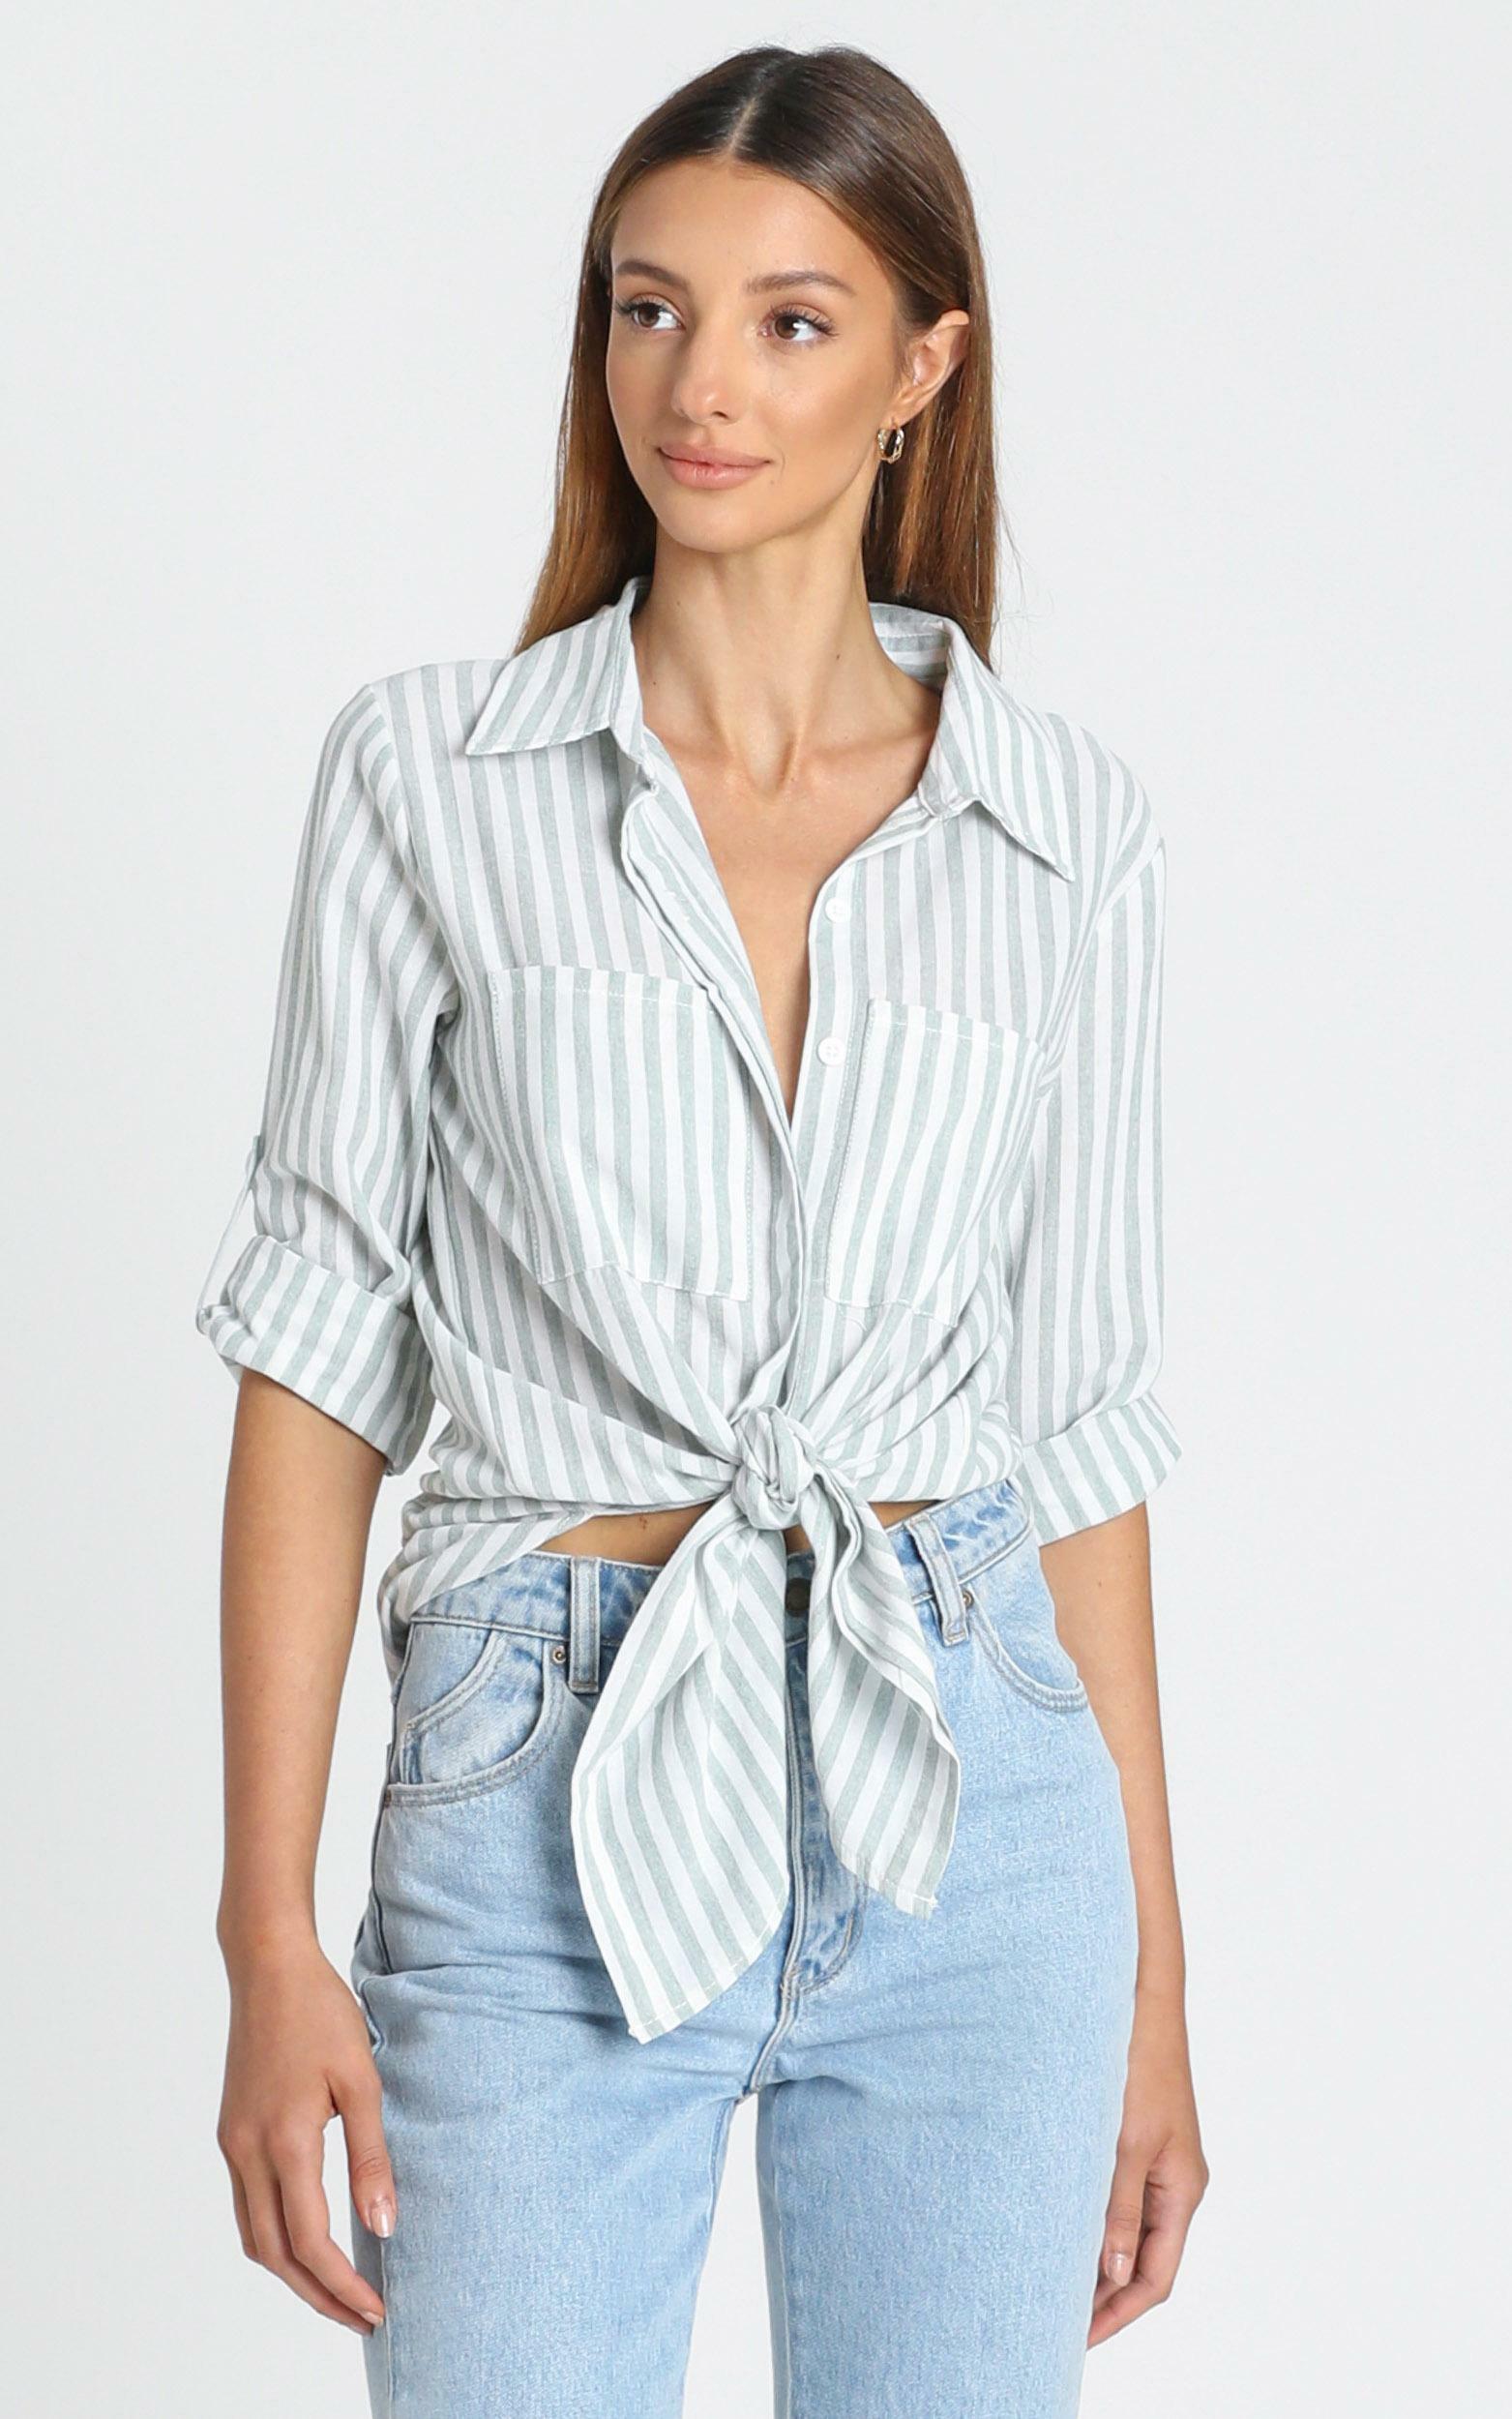 Paris Shirt in Sage Stripe - 8 (S), Sage, hi-res image number null